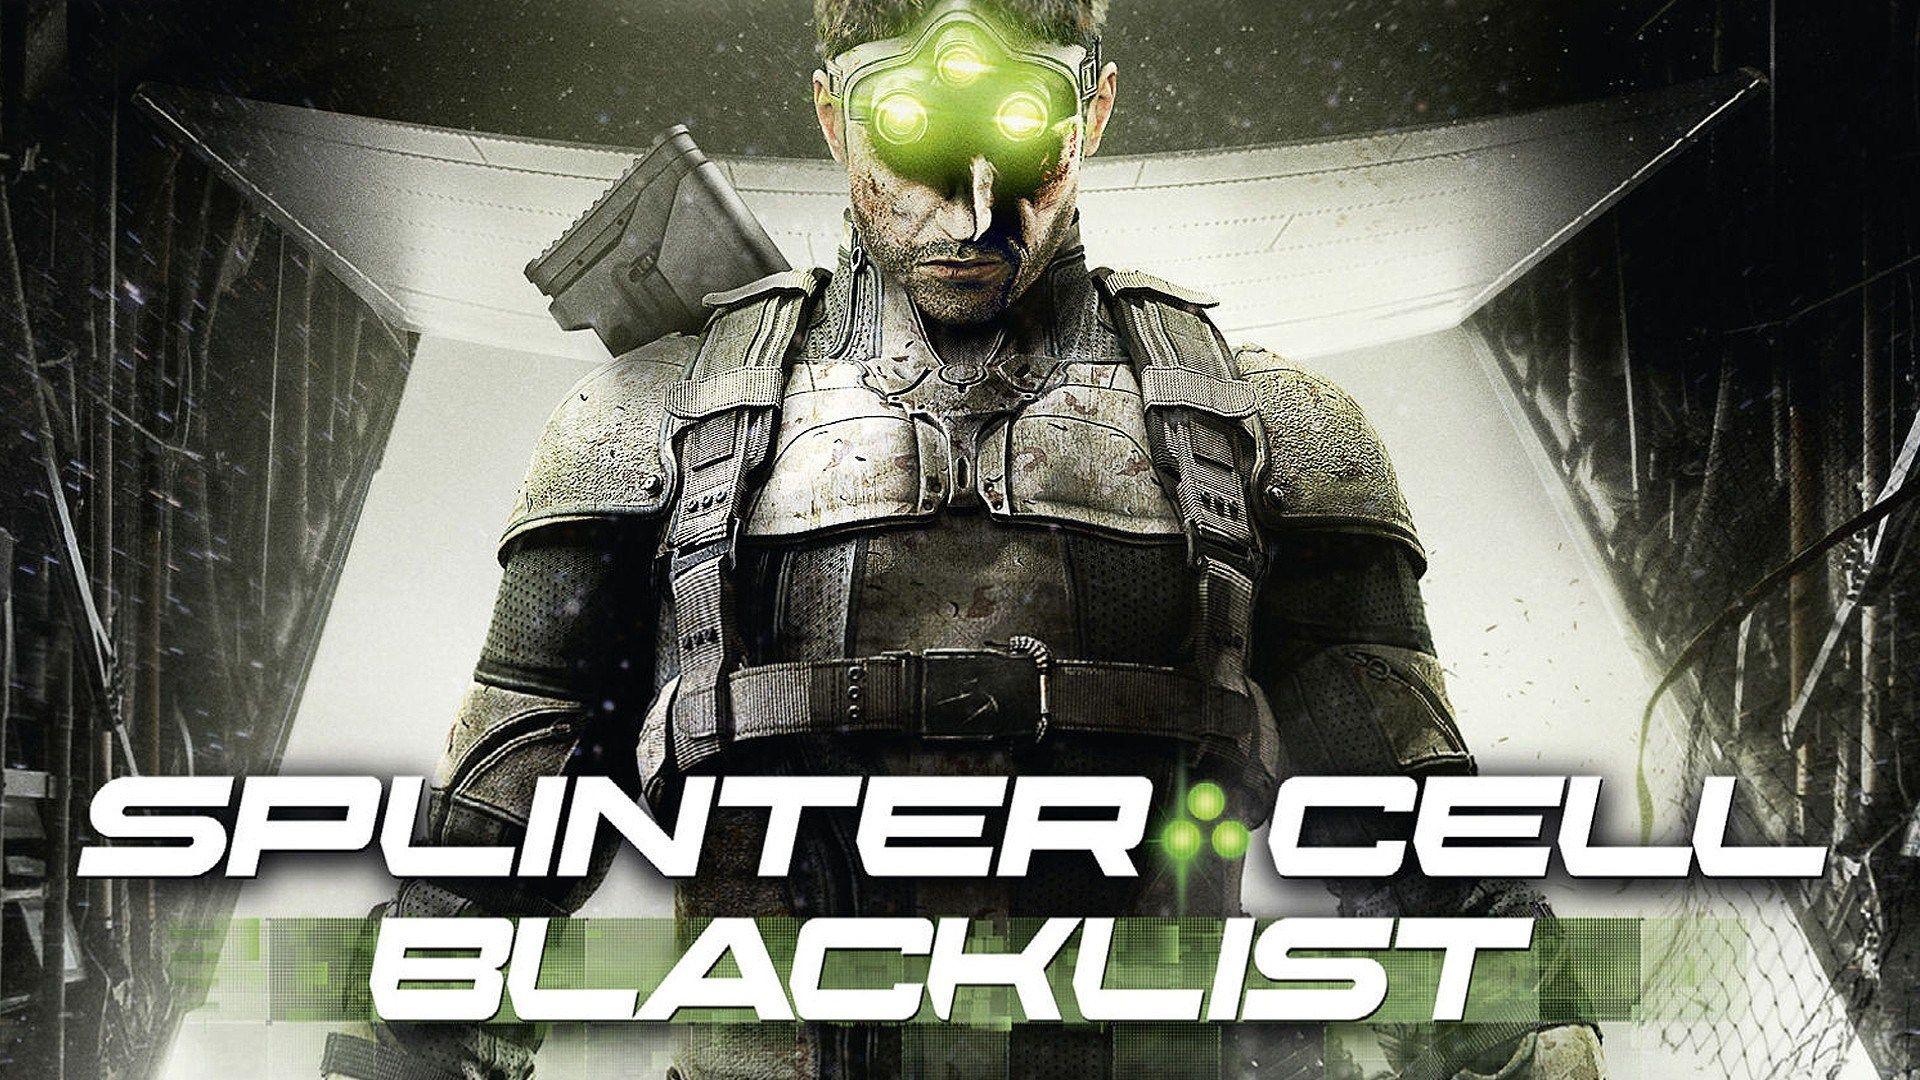 1920x1080 Splinter Cell Blacklist Game Wallpaper